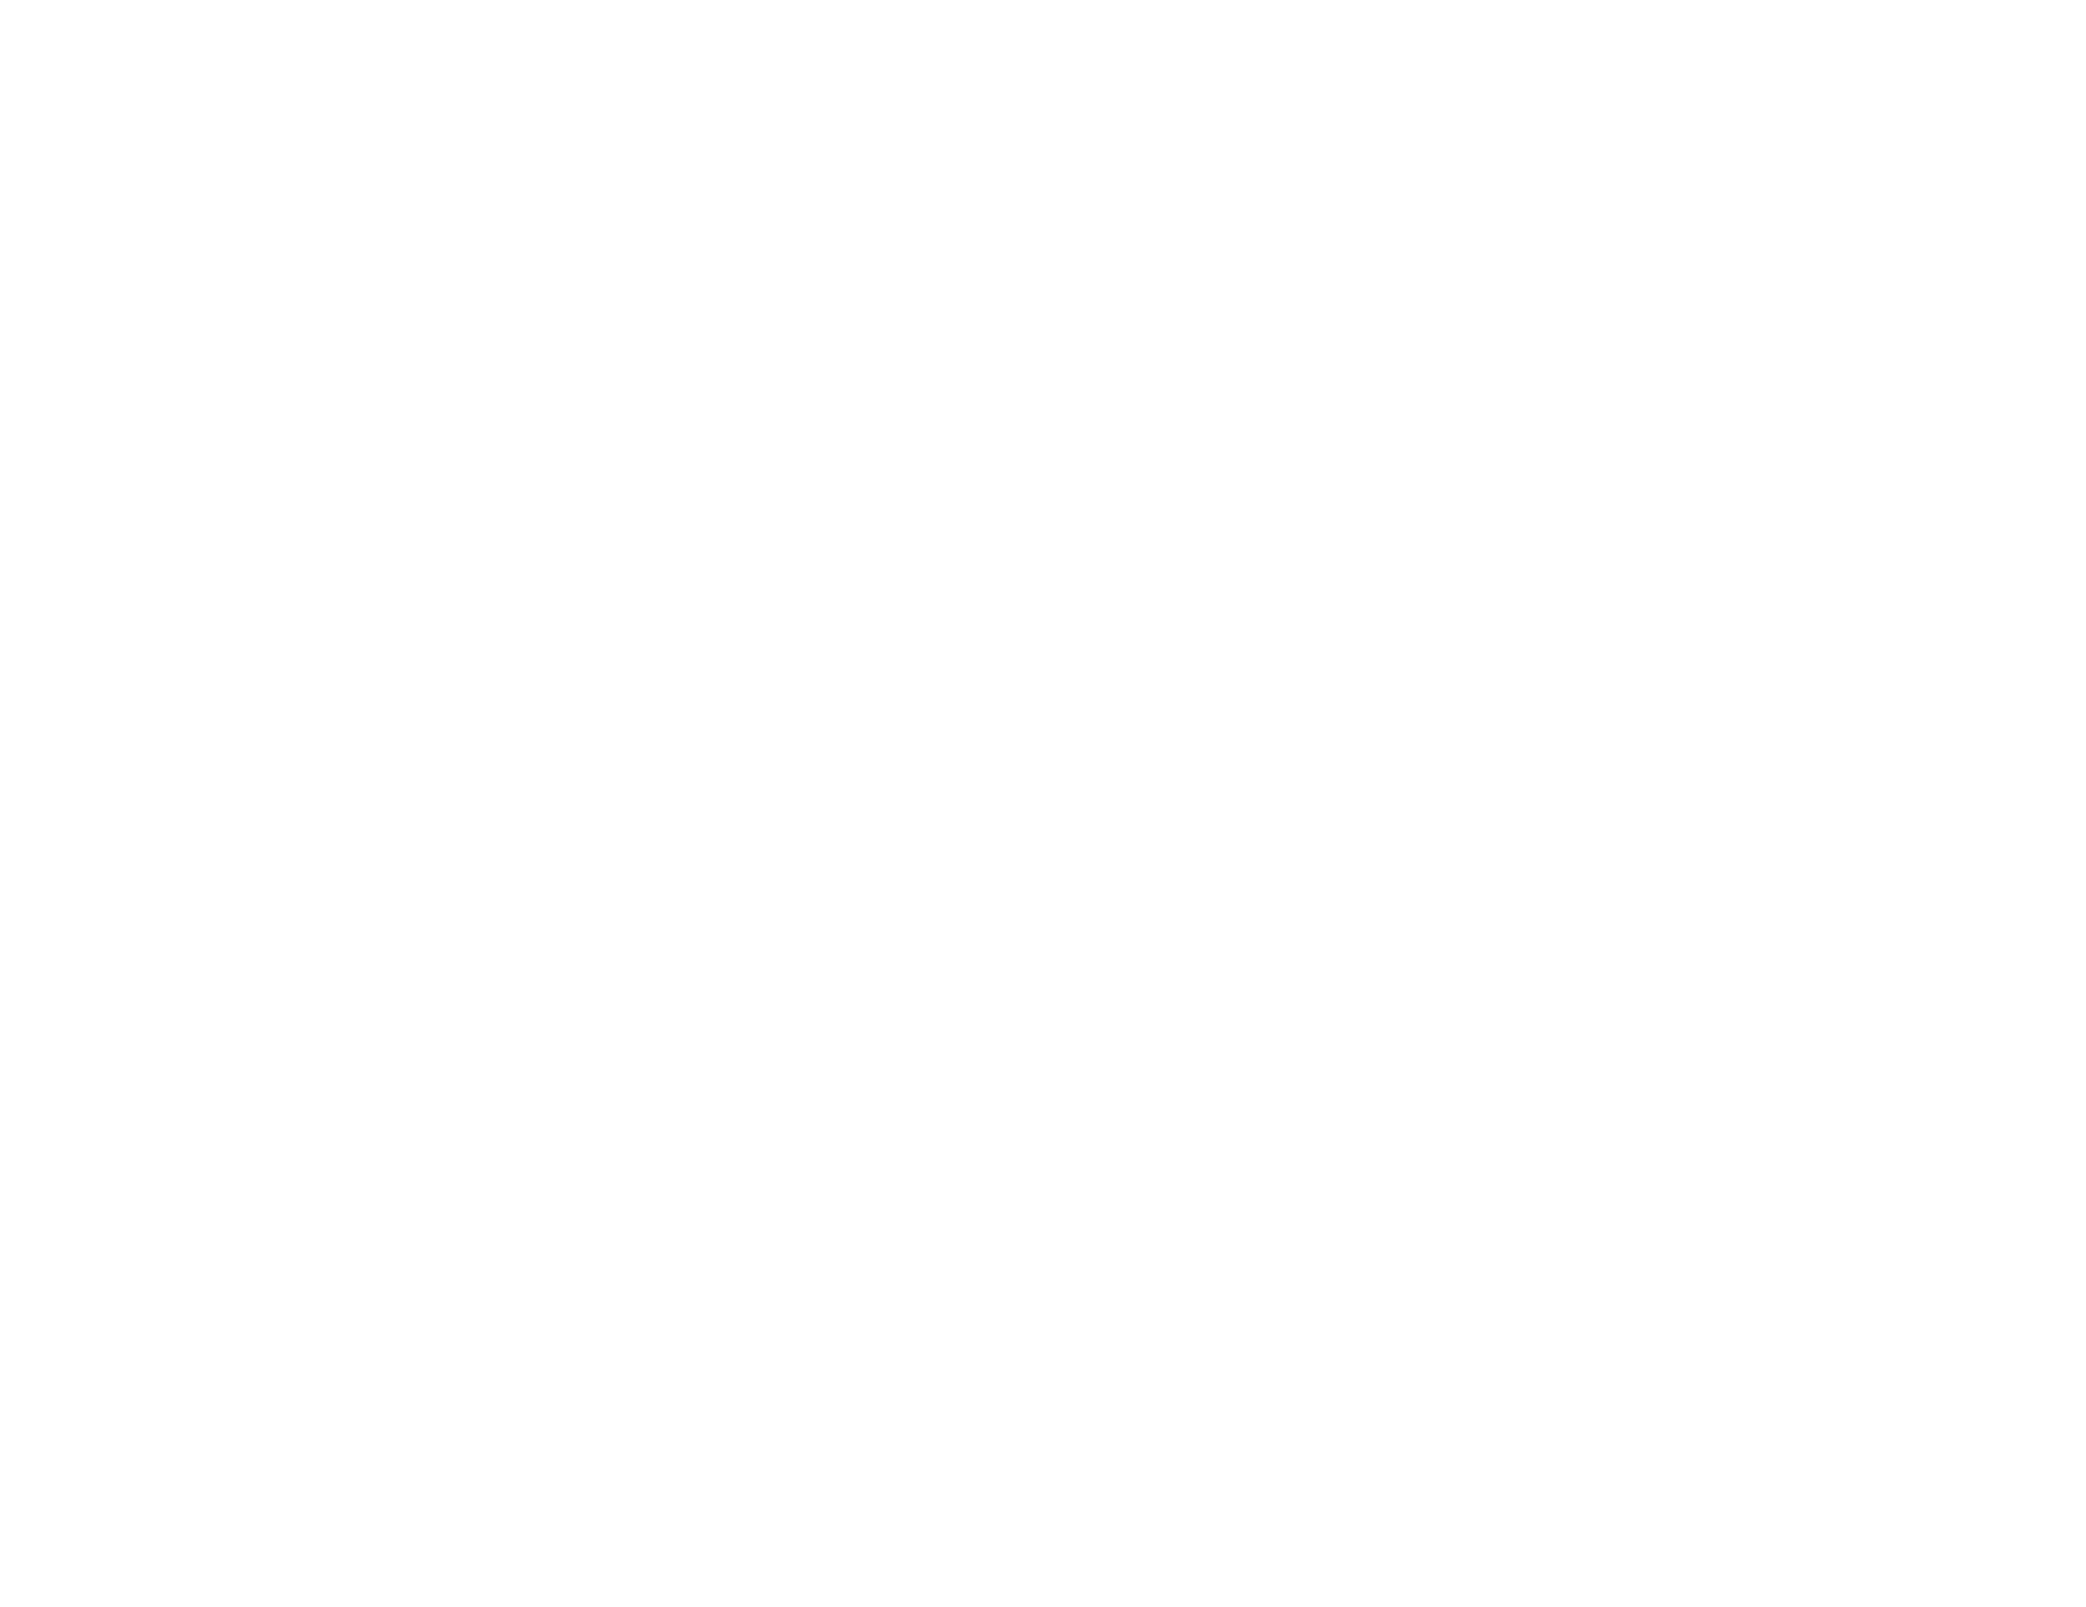 outside_the_box_white copie